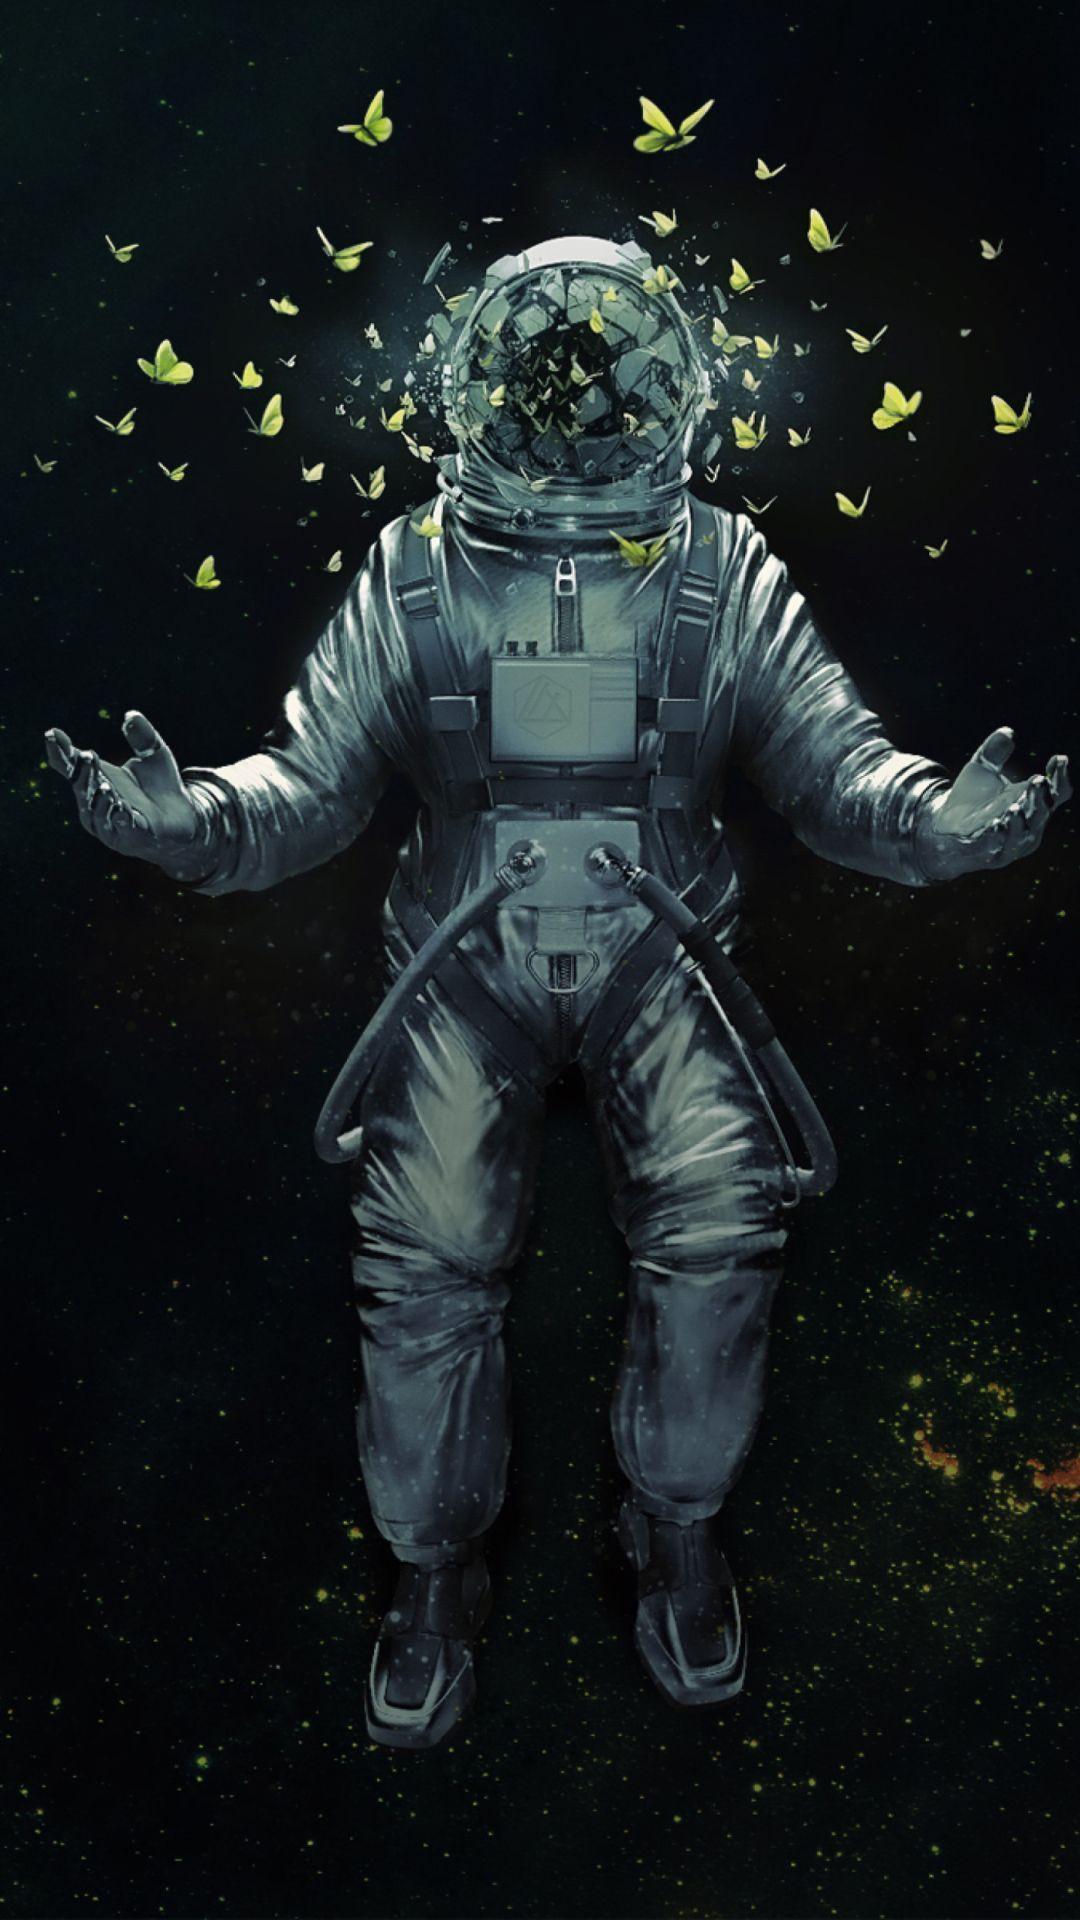 Astronaut Phone Wallpapers Top Free Astronaut Phone